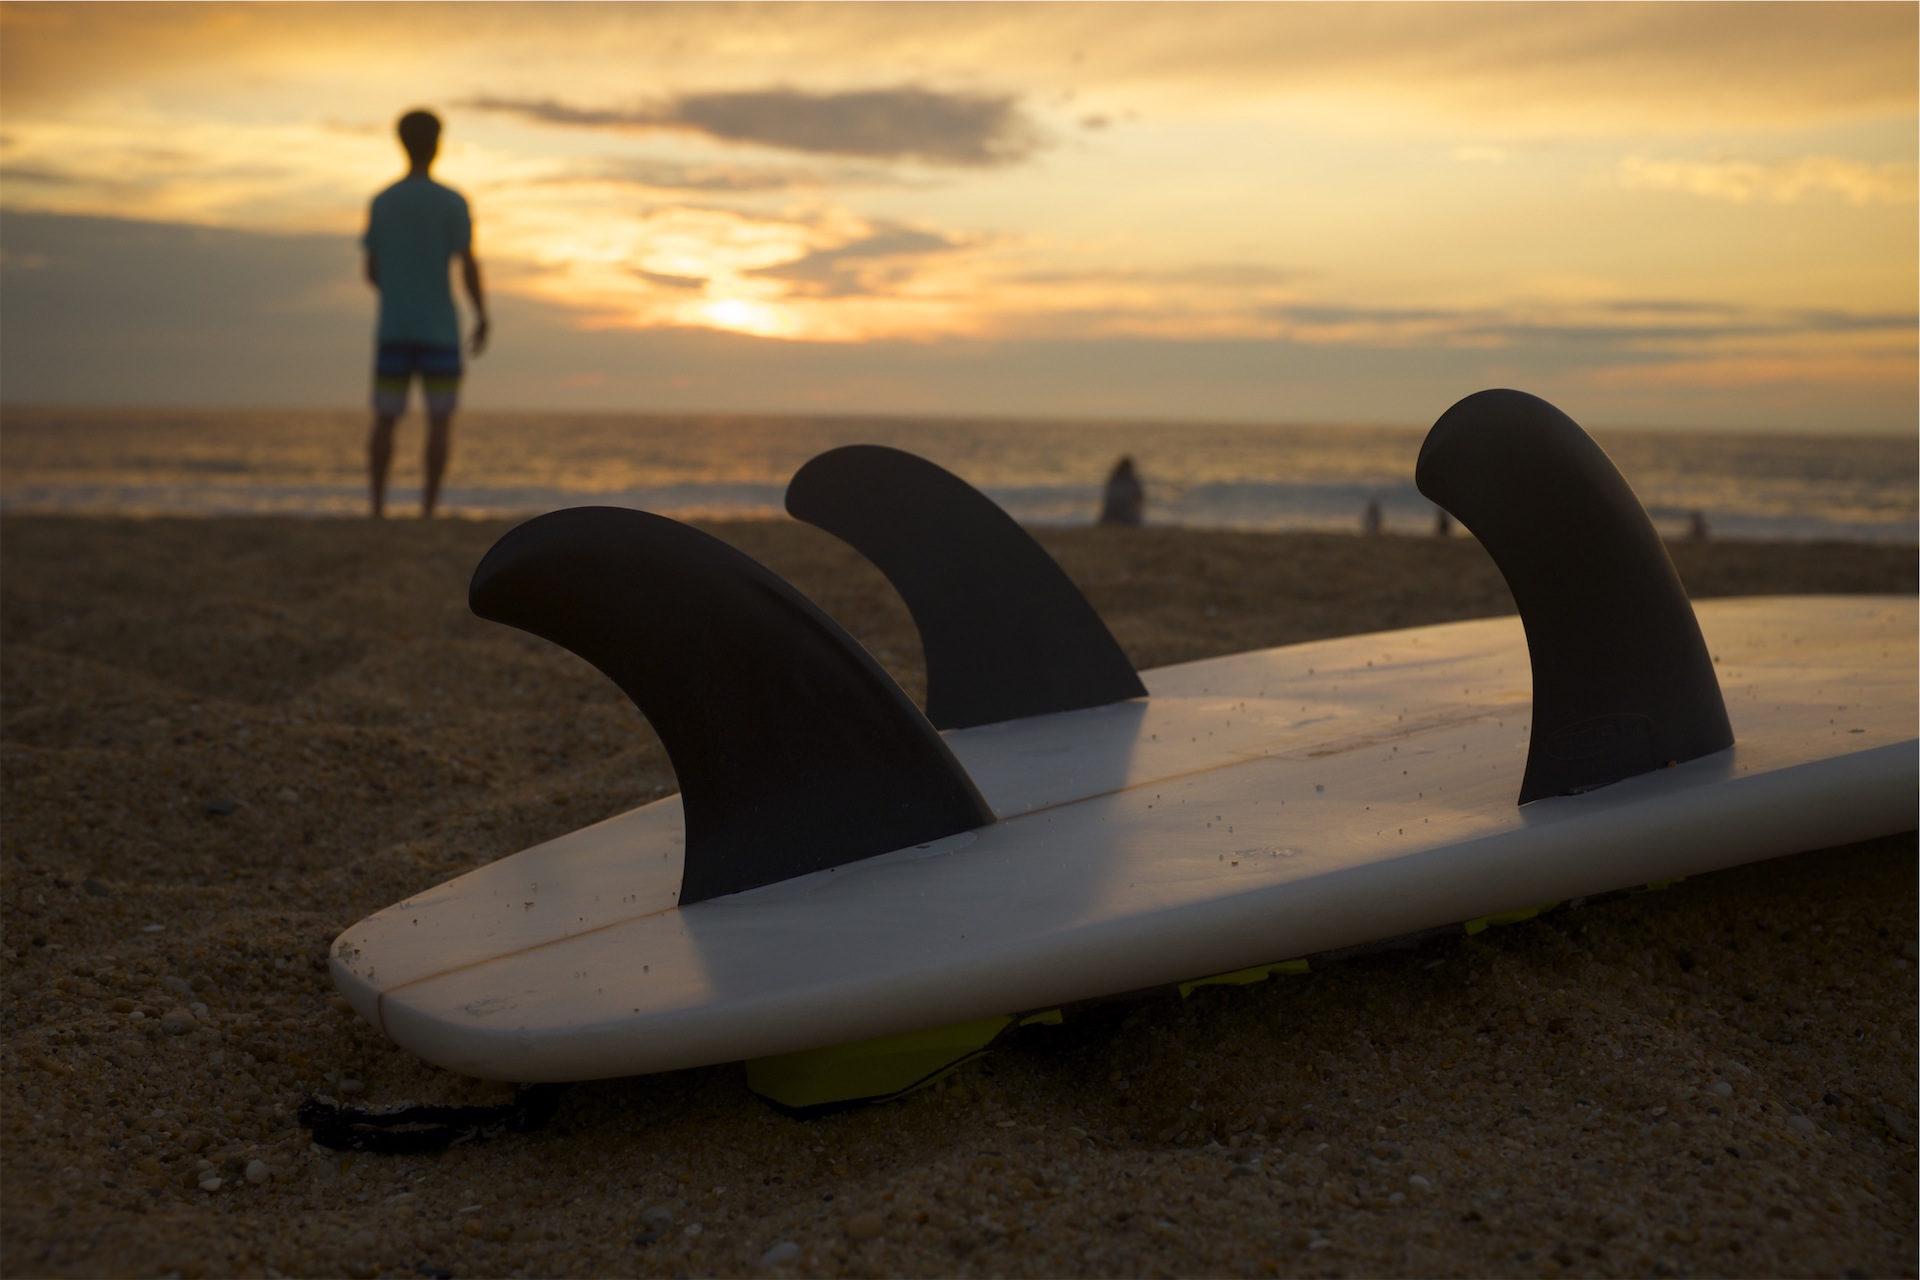 surf, playa, tabla, arena, riesgo - Fondos de Pantalla HD - professor-falken.com